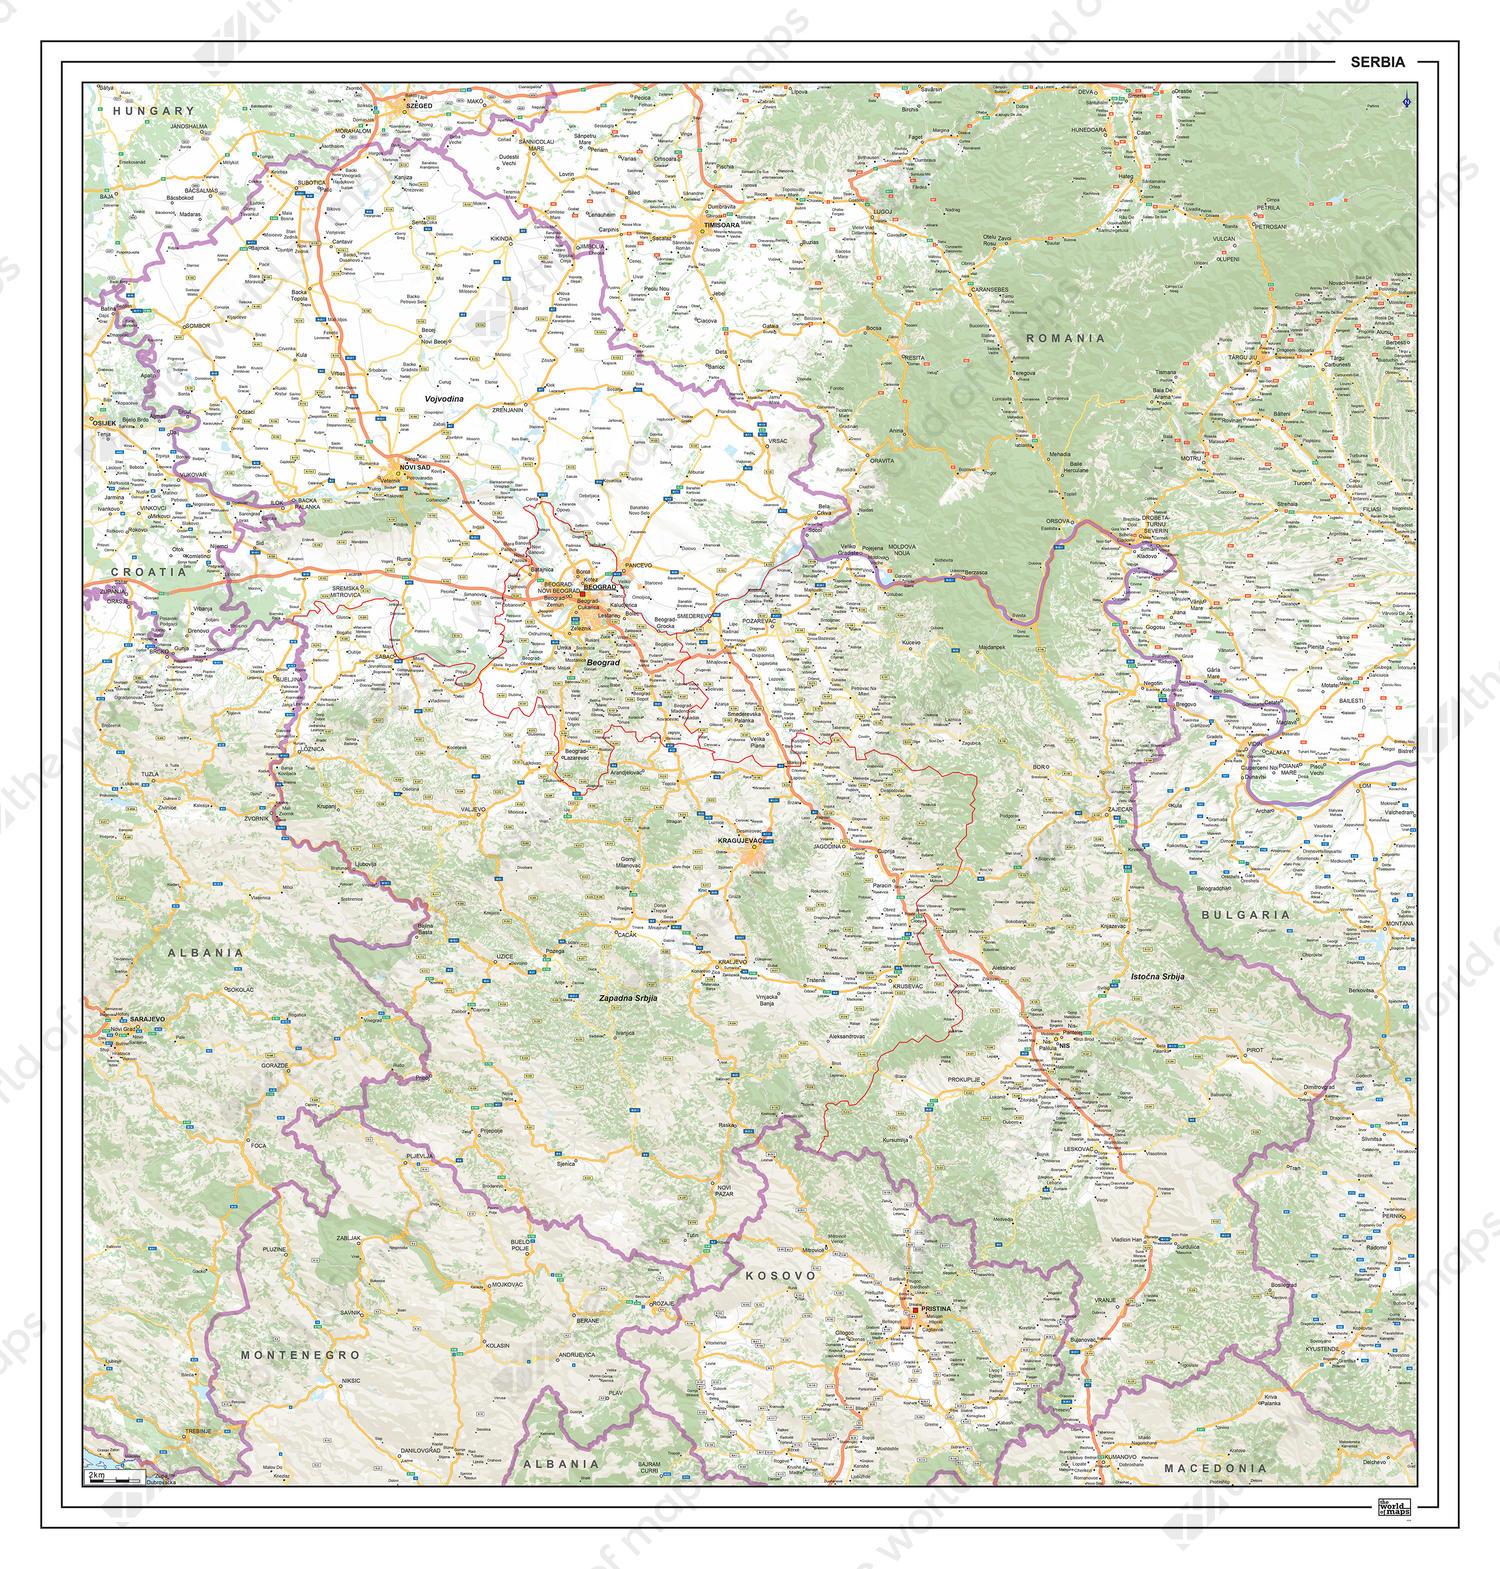 Digital Roadmap Serbia